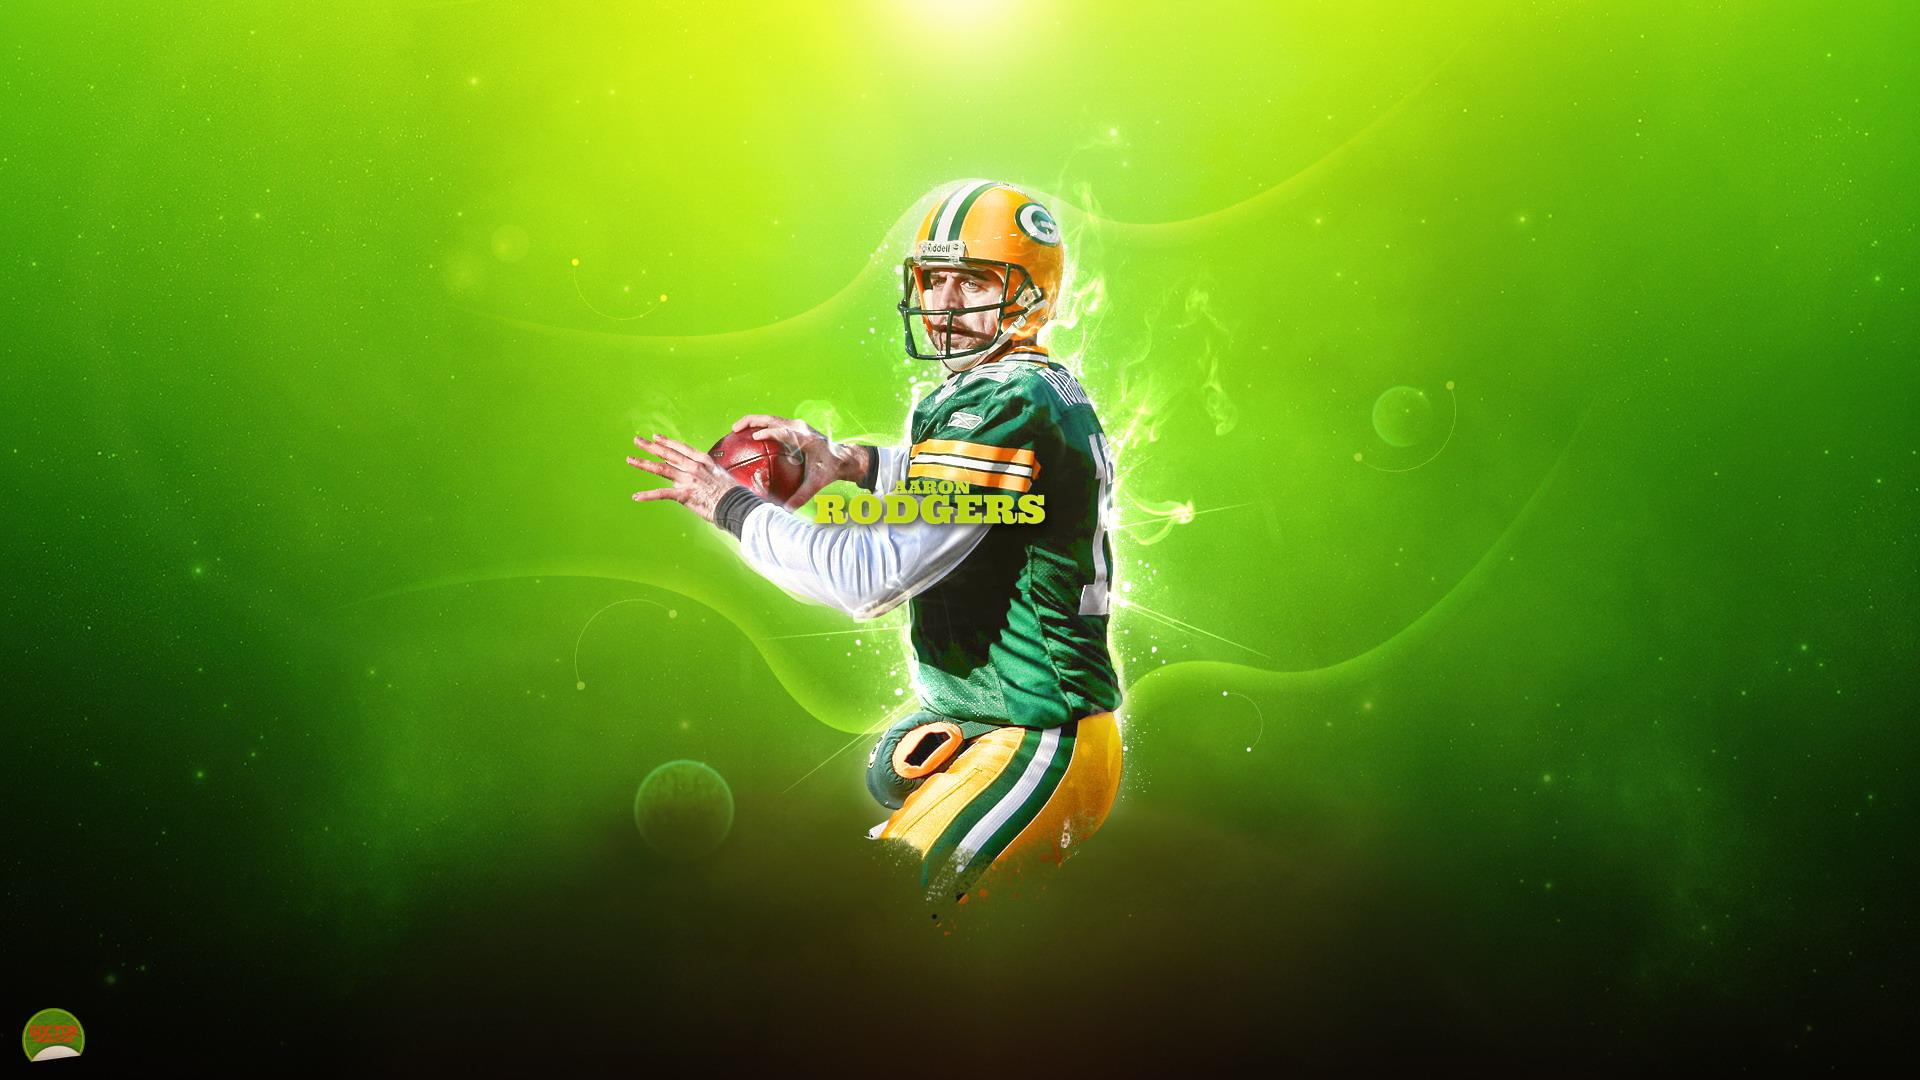 GREEN BAY PACKERS nfl football n wallpaper 1920x1080 1920x1080